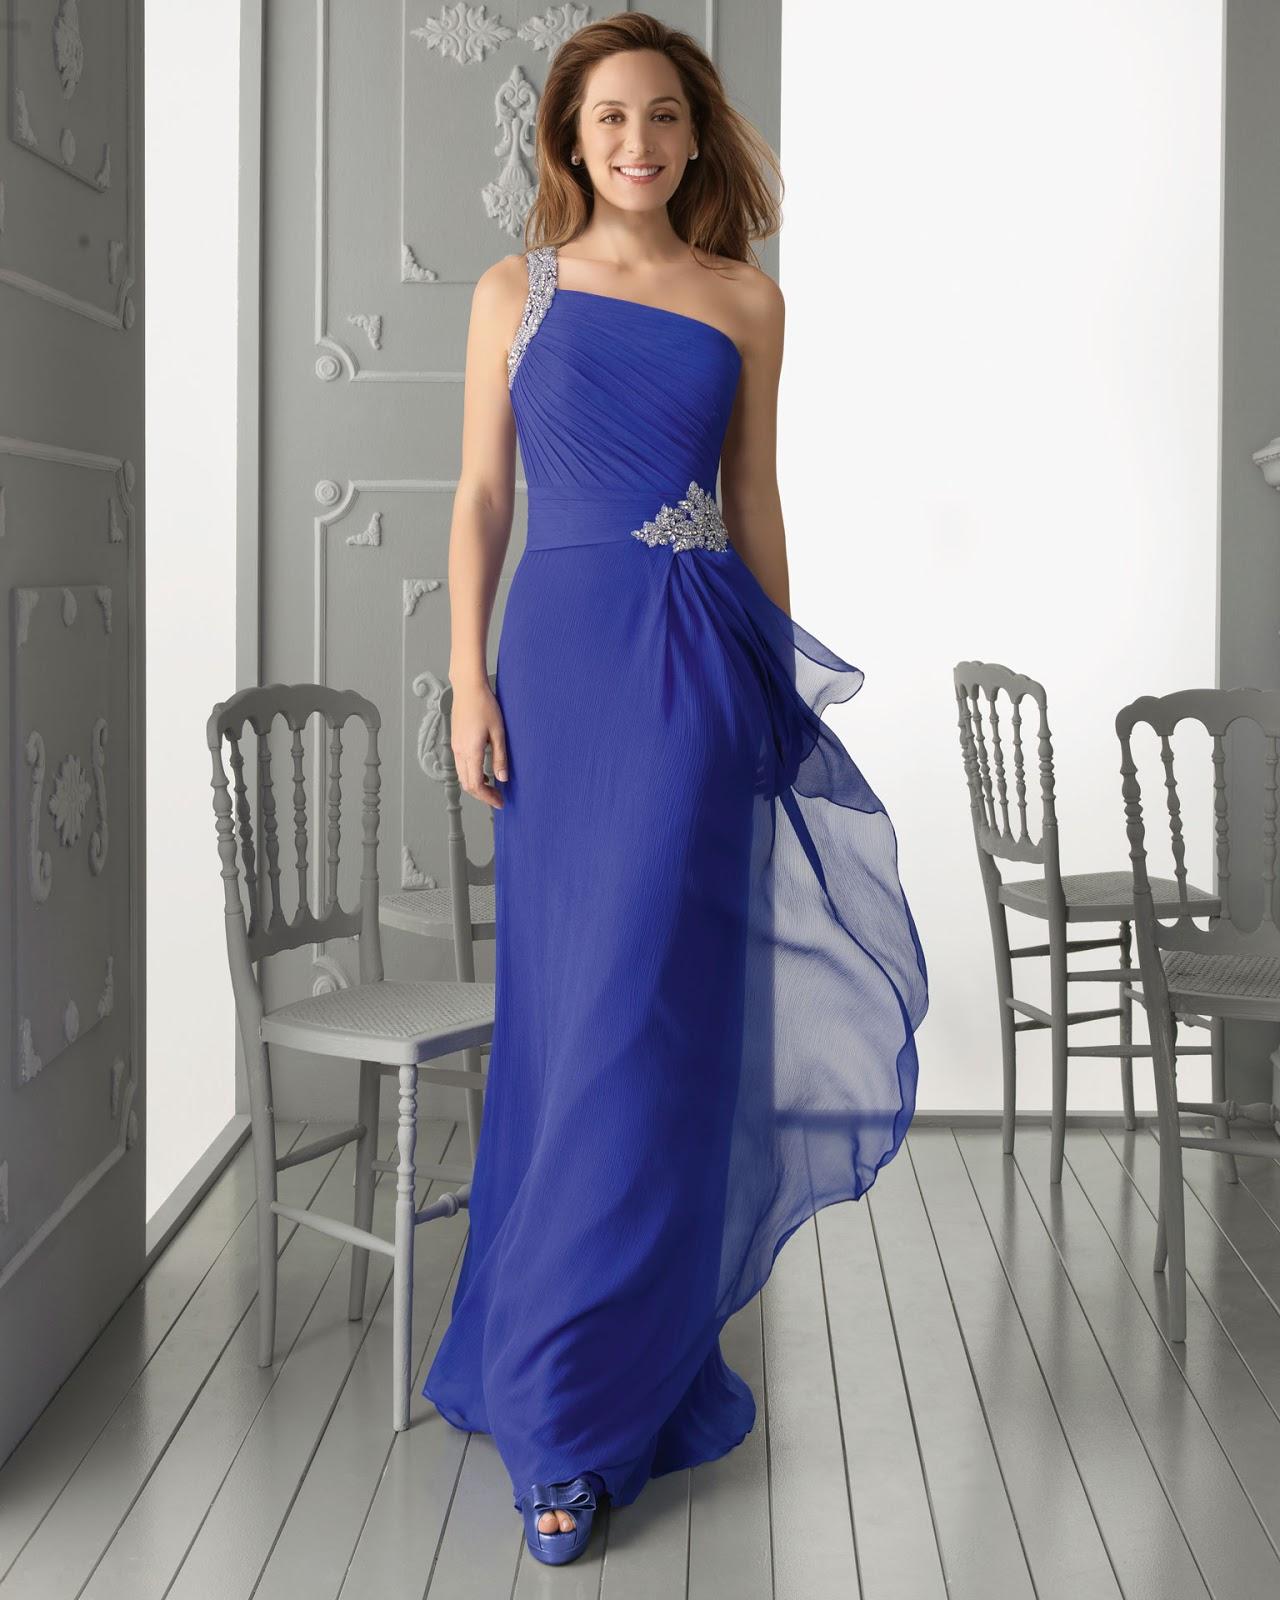 Asombroso Vestidos De Novia Aire 2015 Imagen - Vestido de Novia Para ...